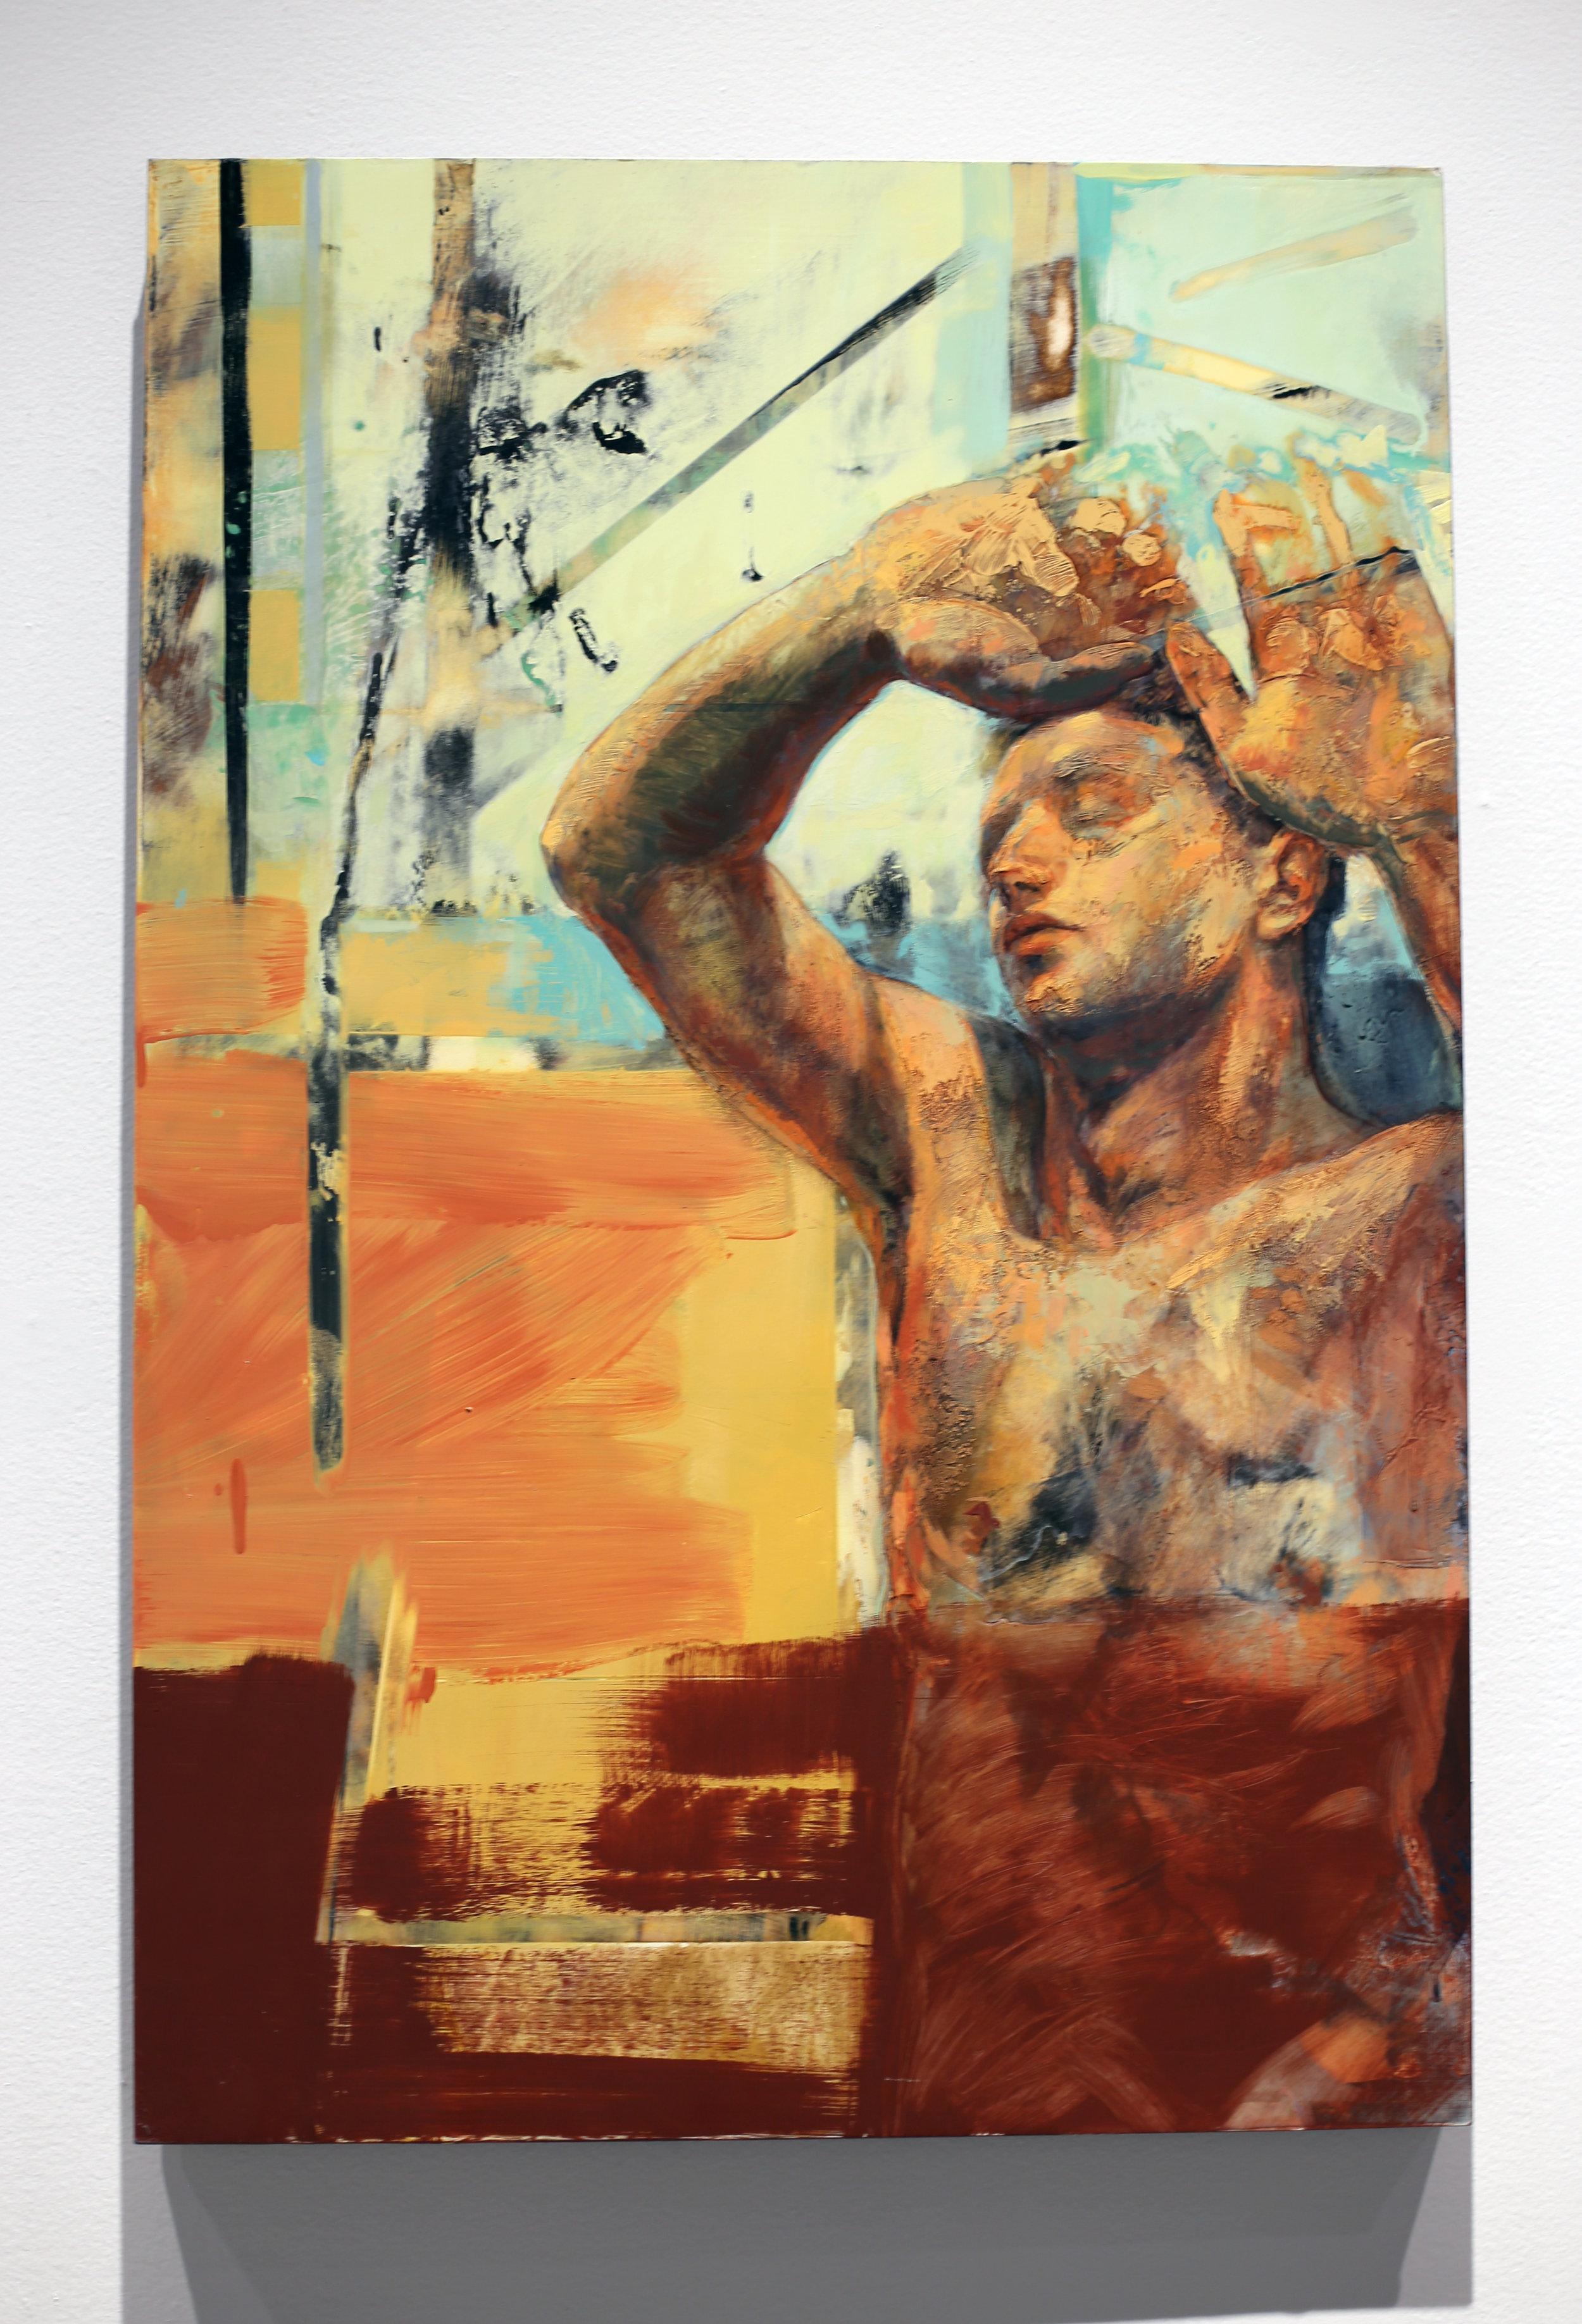 Bruce Herman, Persistence of Vision, Oil, gold leaf on wood